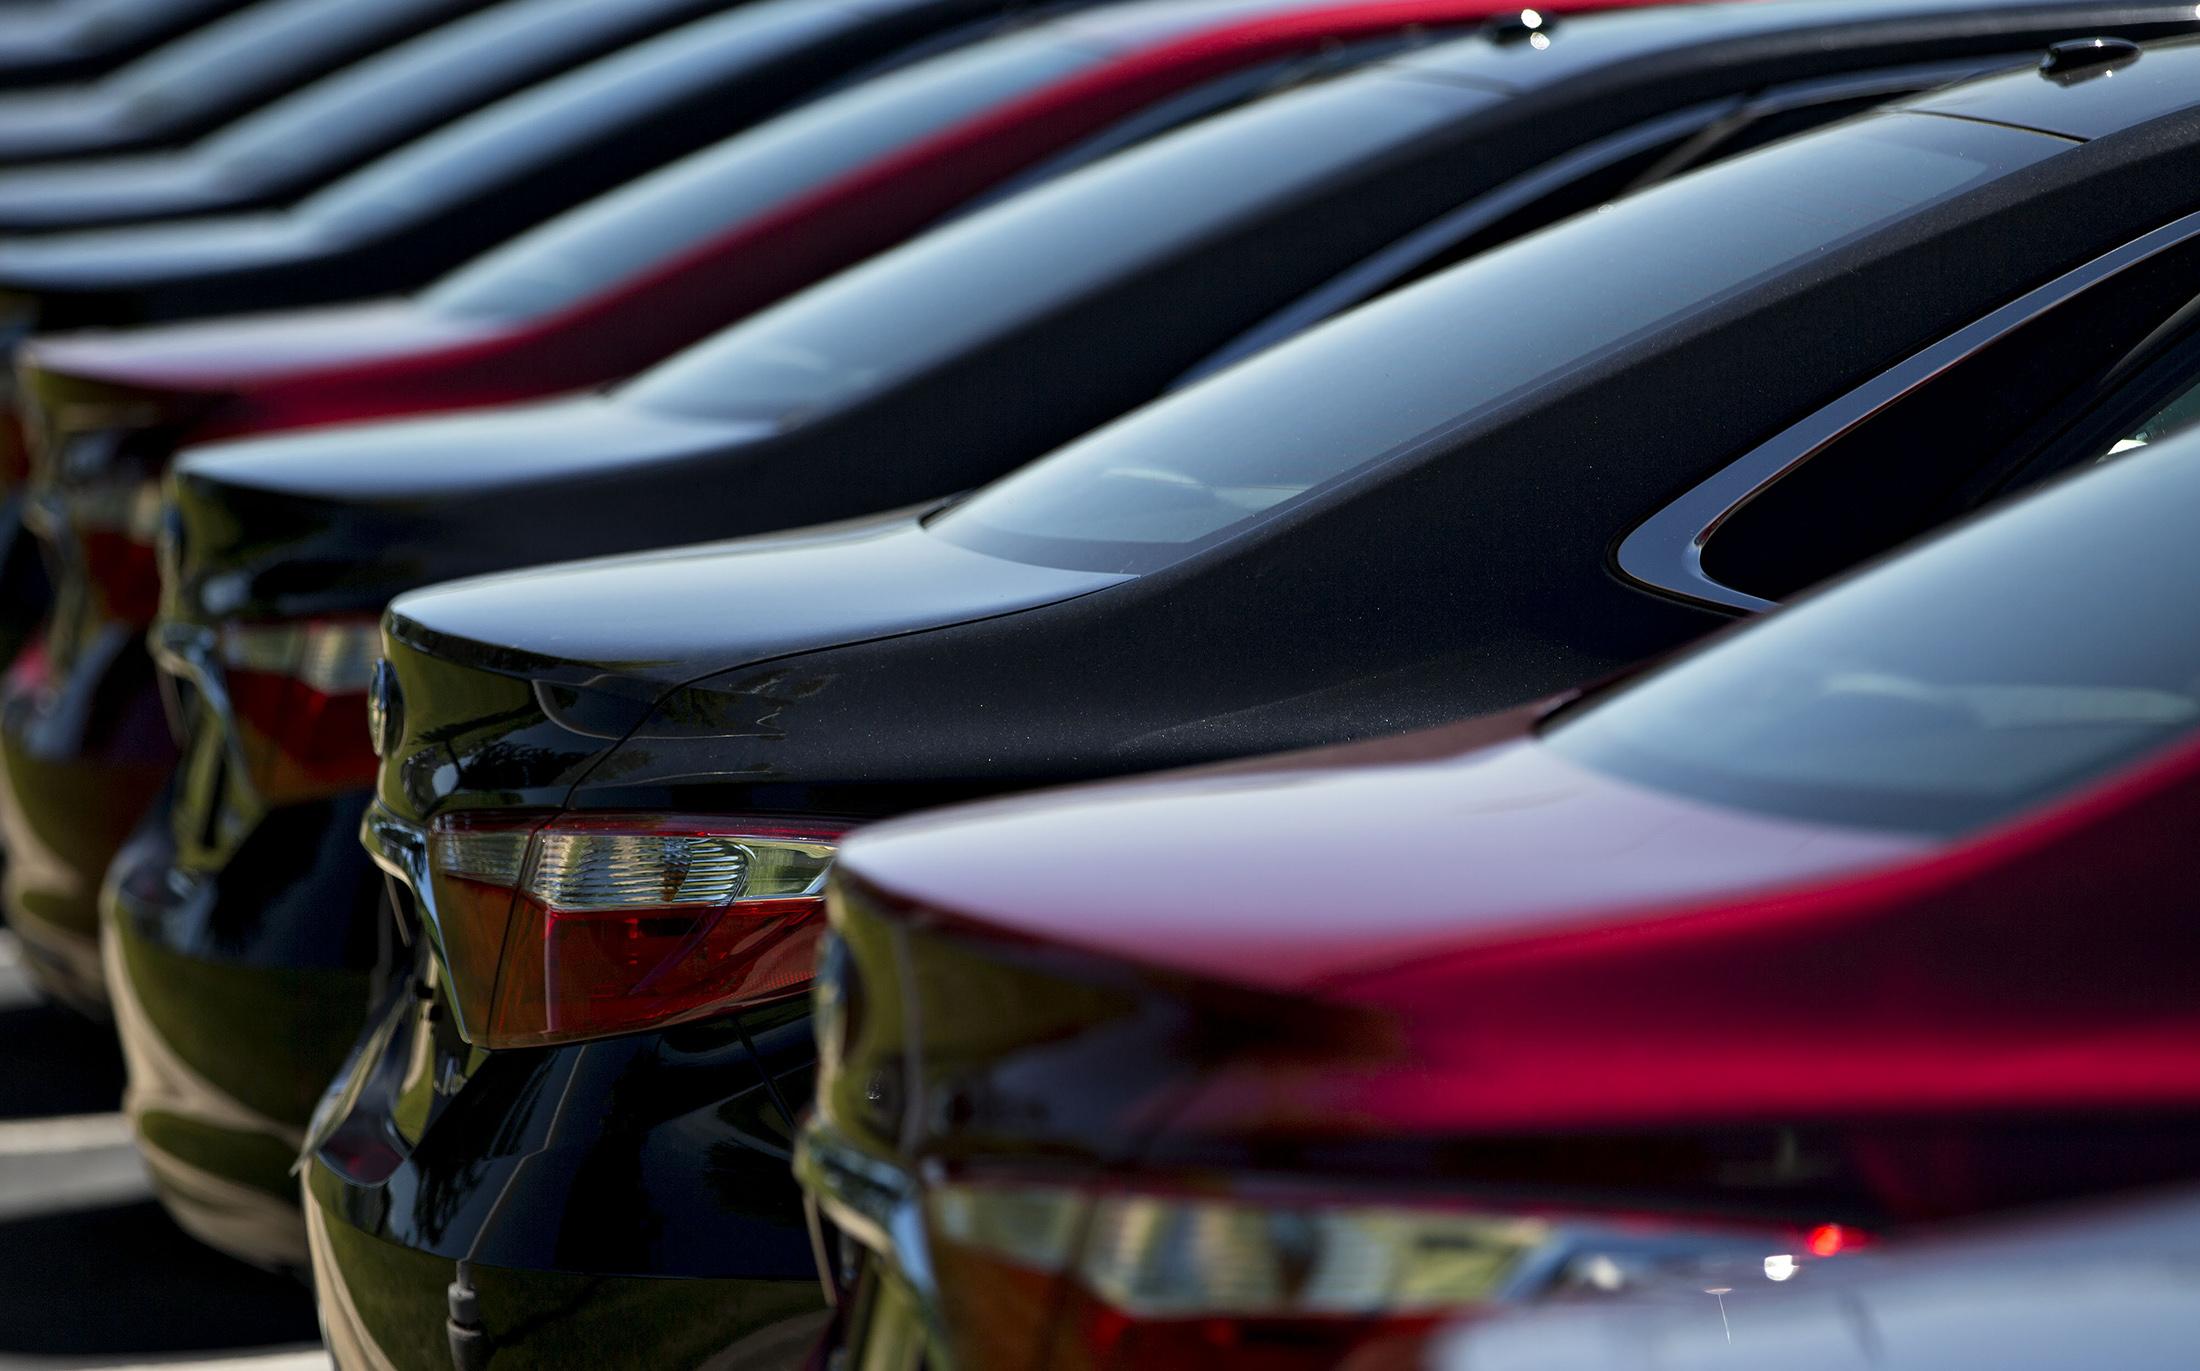 Amazon Eyeing British Drivers Sends Auto Trader Shares Tumbling ...